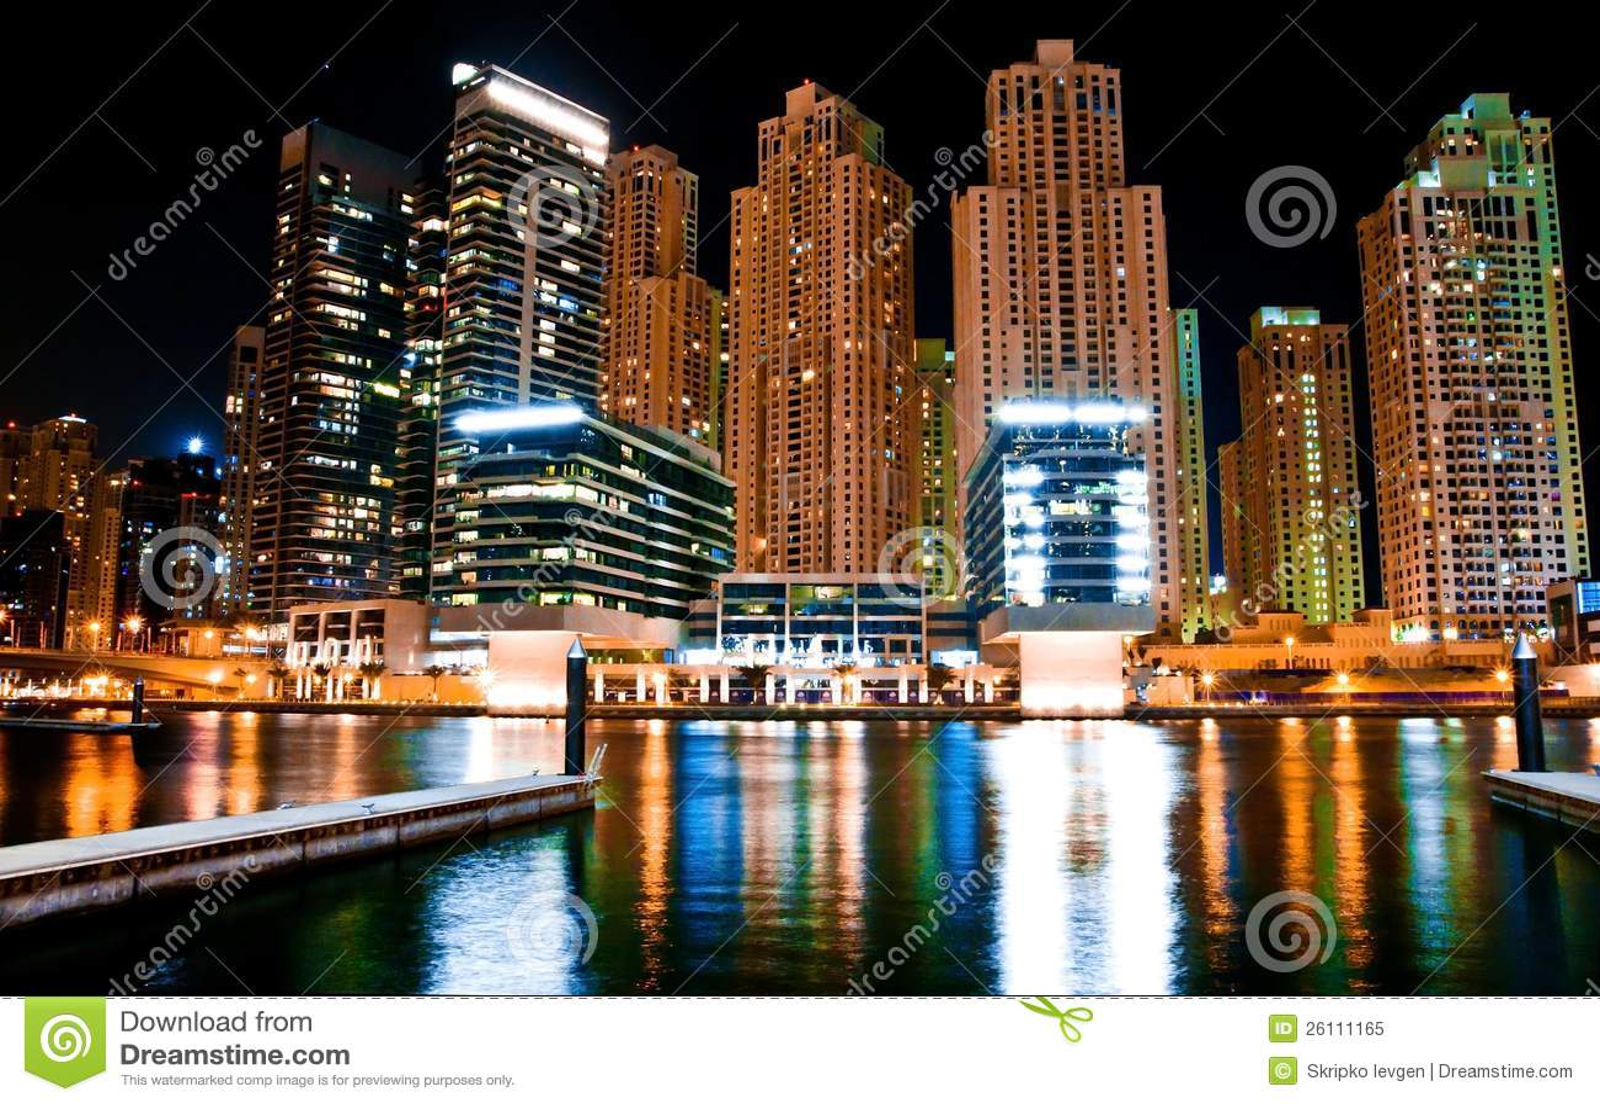 Nattliggandemetropolis